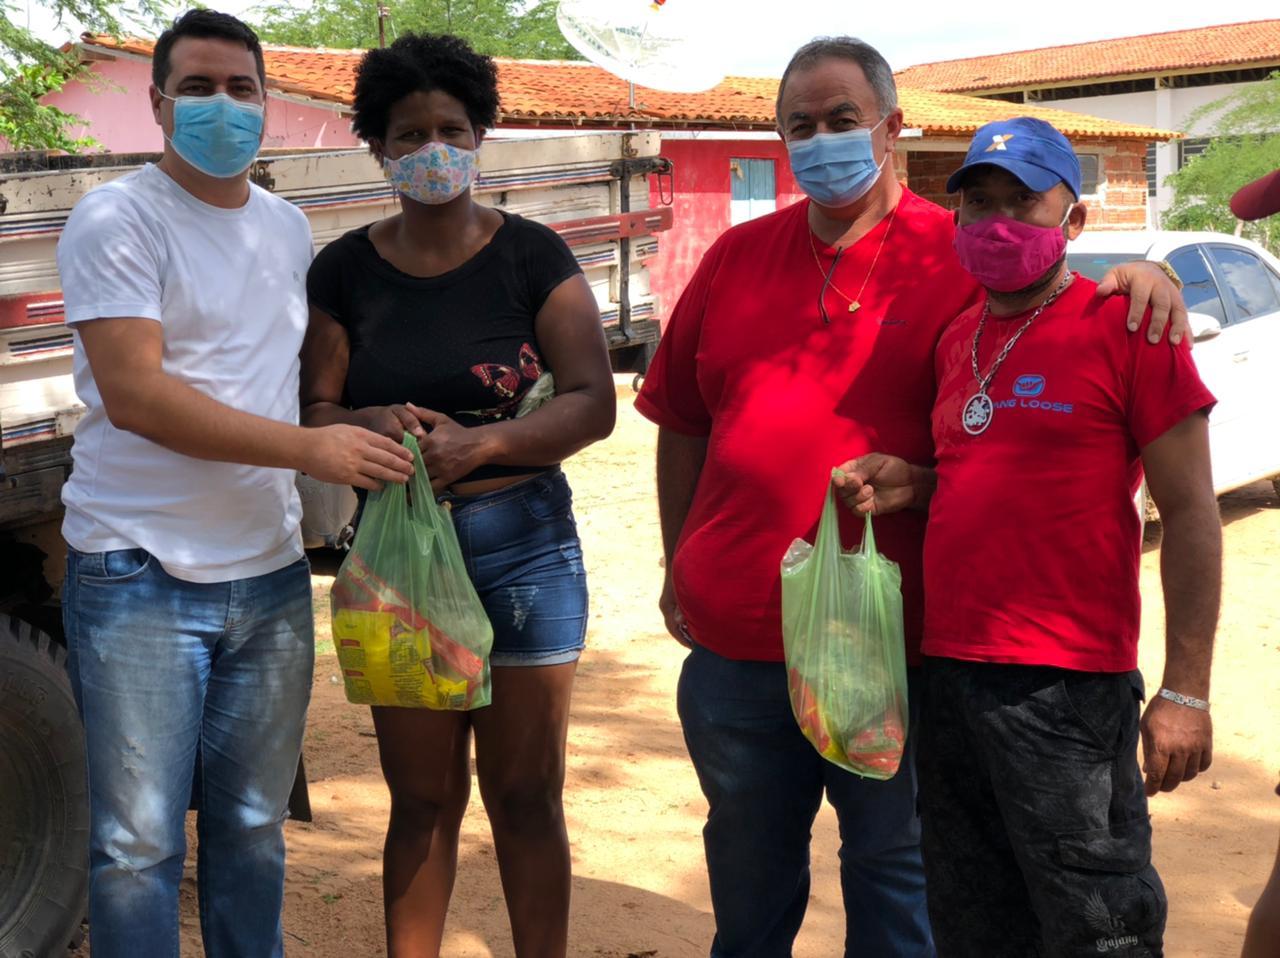 Prefeitura de Cubati distribui Kit Páscoa para famílias carentes do município